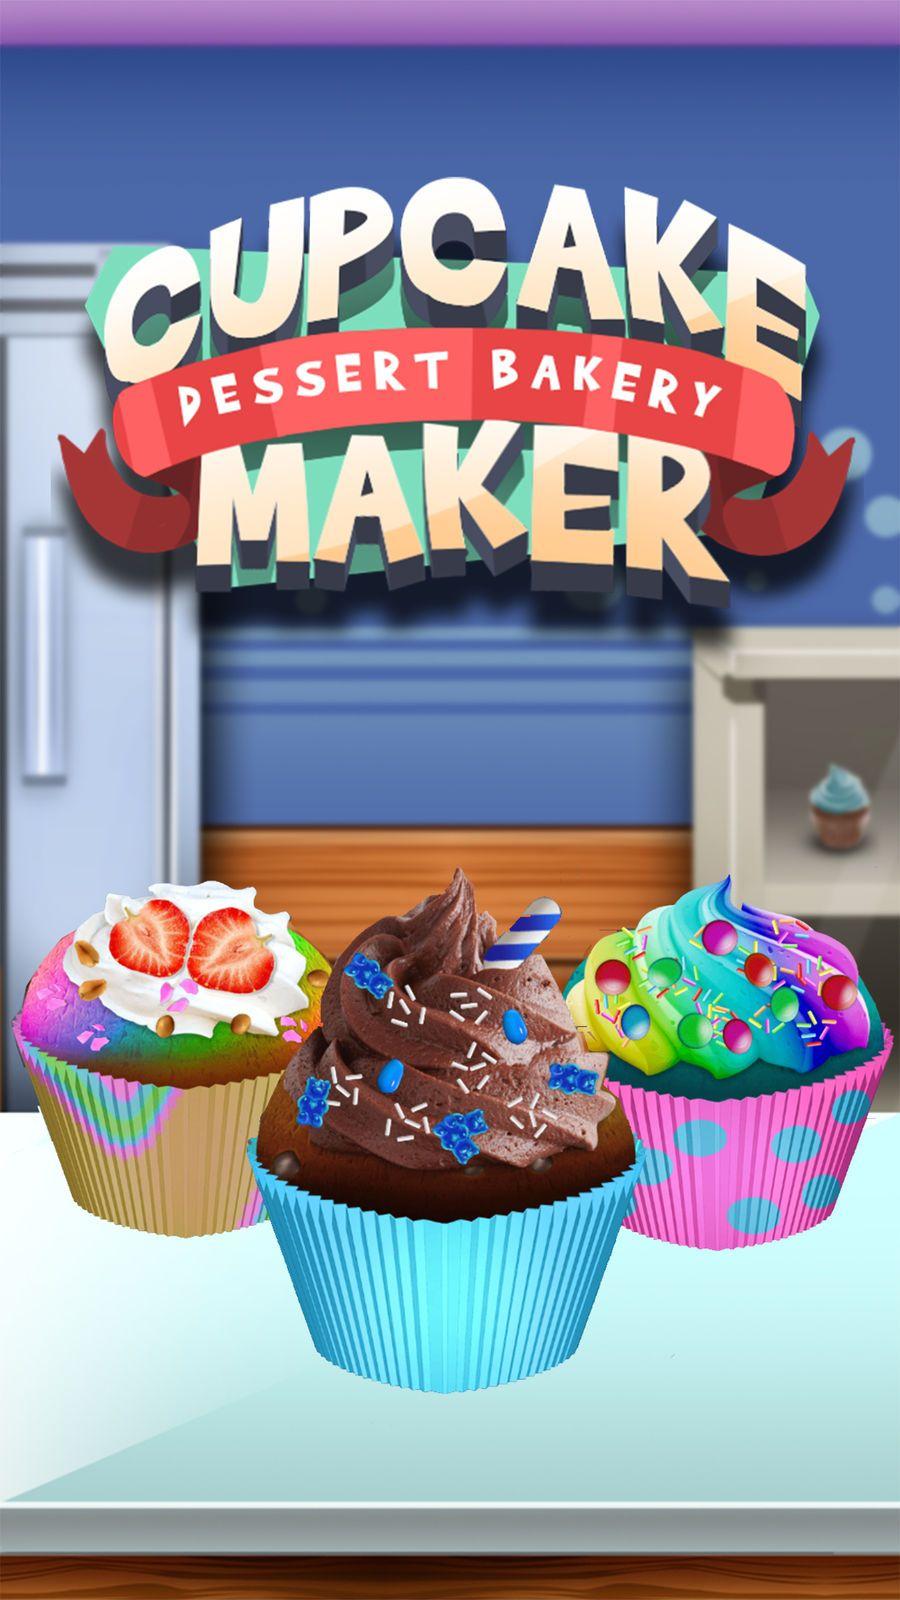 Awesome Ice Cream Cupcake Maker Baking Dessert Top Dessert